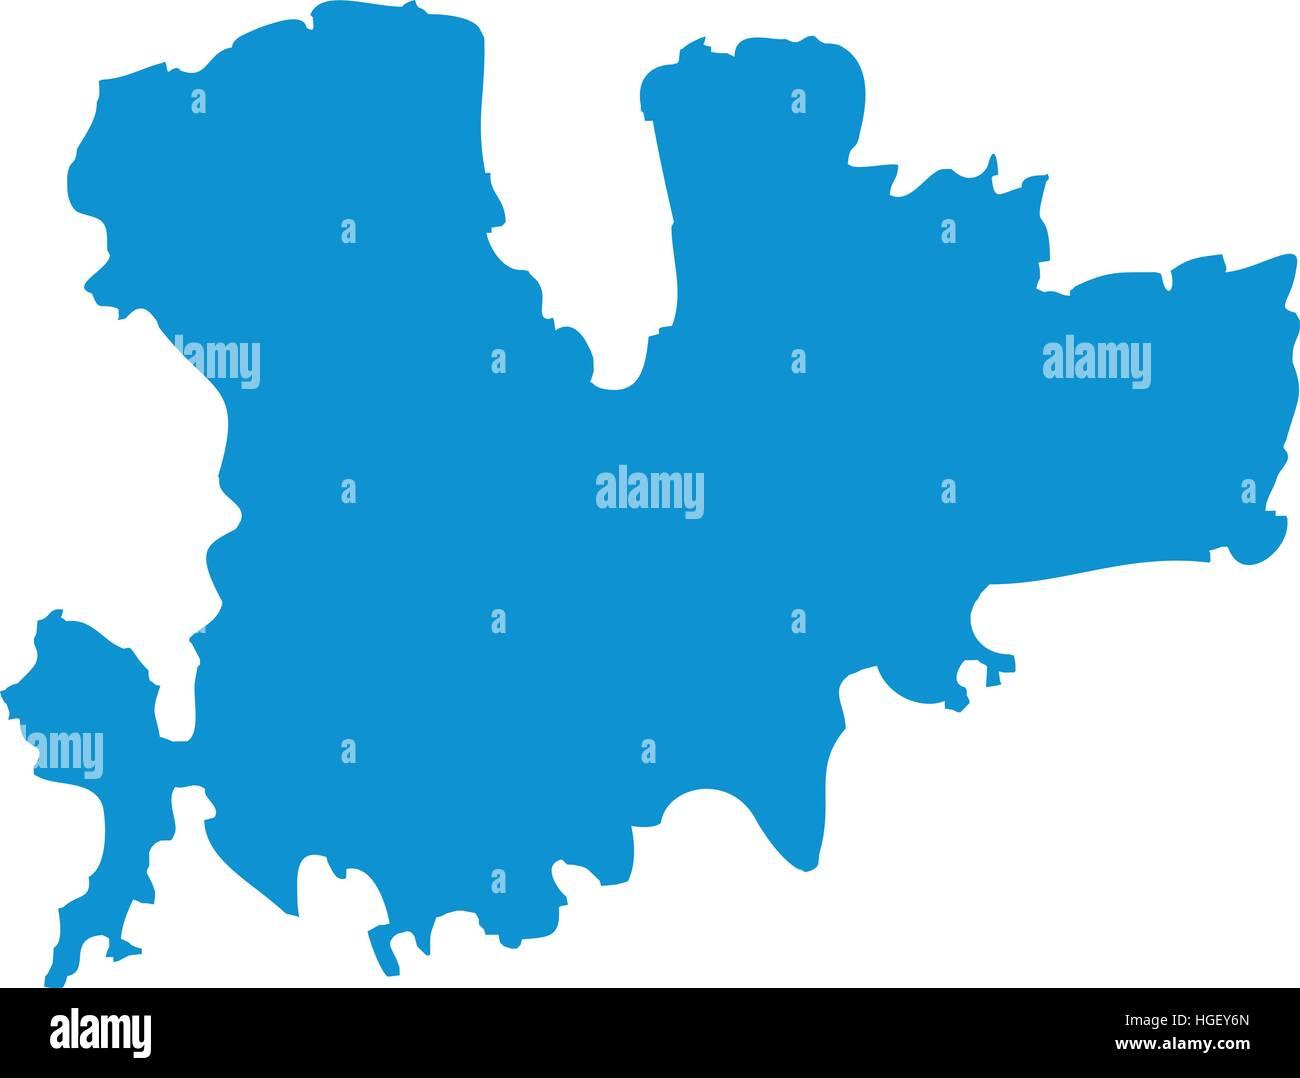 mykonos karte Mykonos Karte silhouette Vektor Abbildung   Bild: 130635757   Alamy